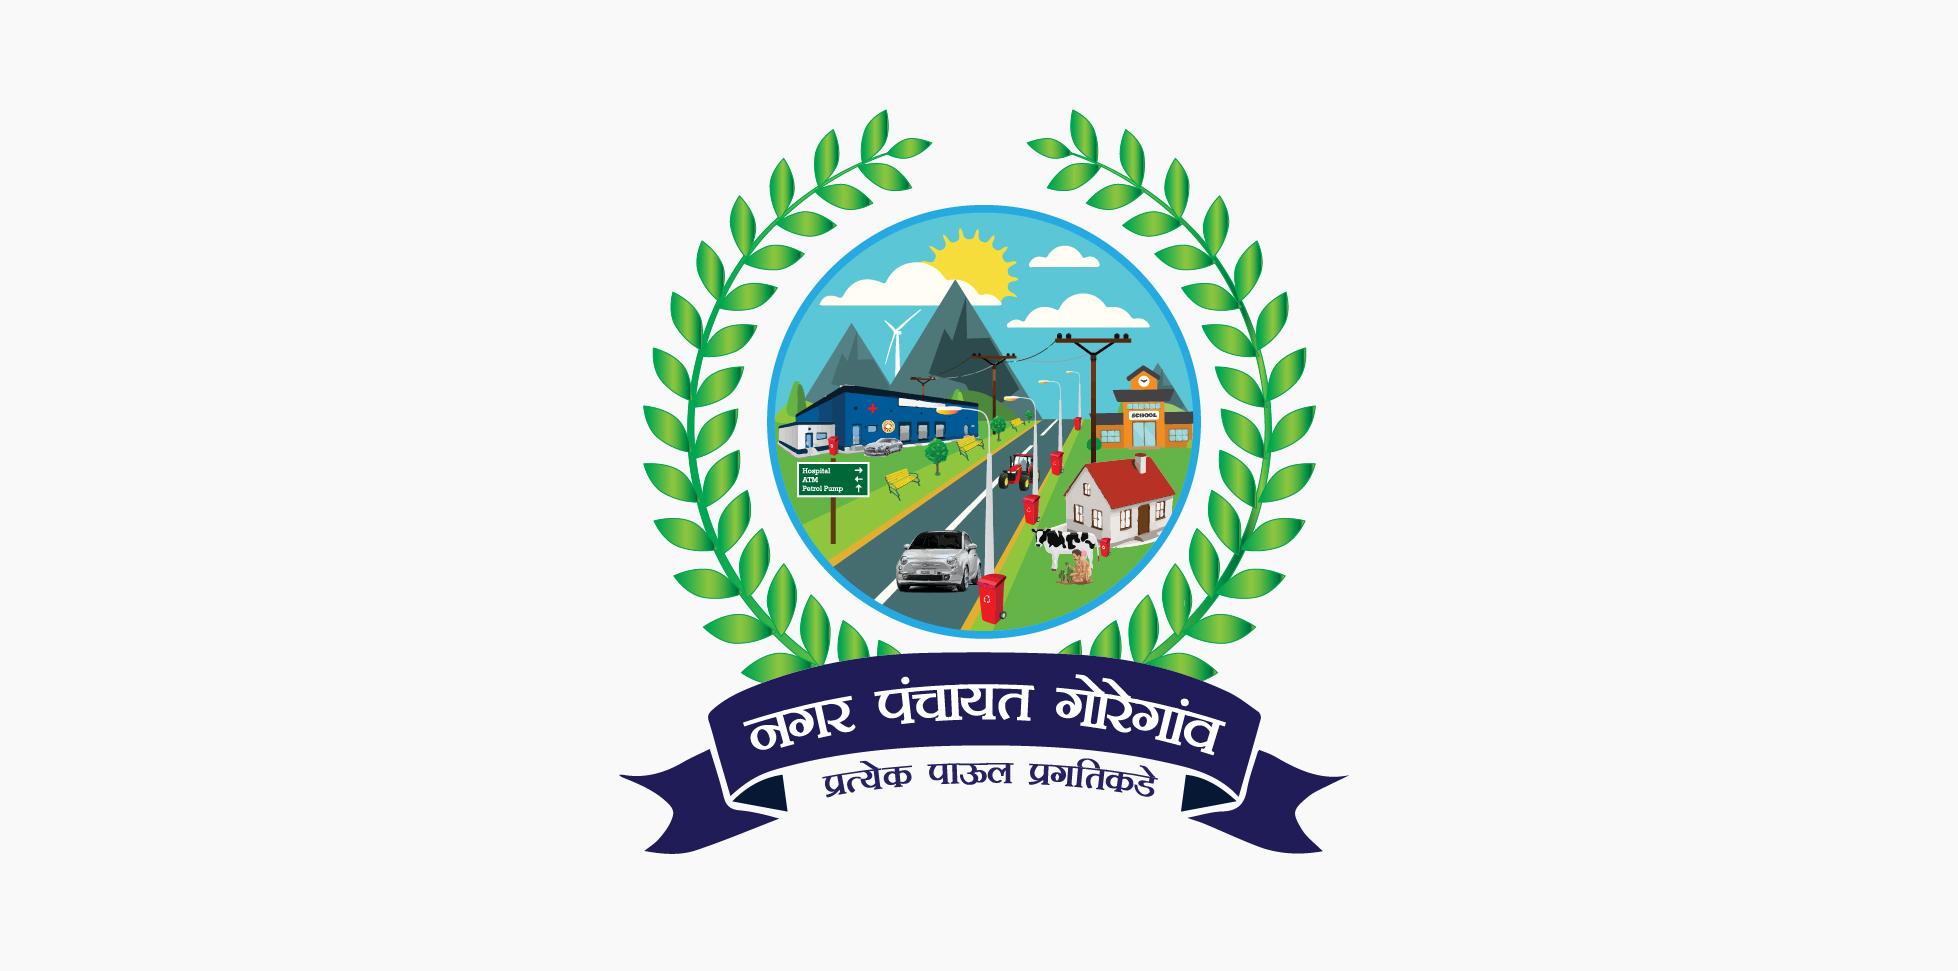 Nagar Panchayat Goregoan